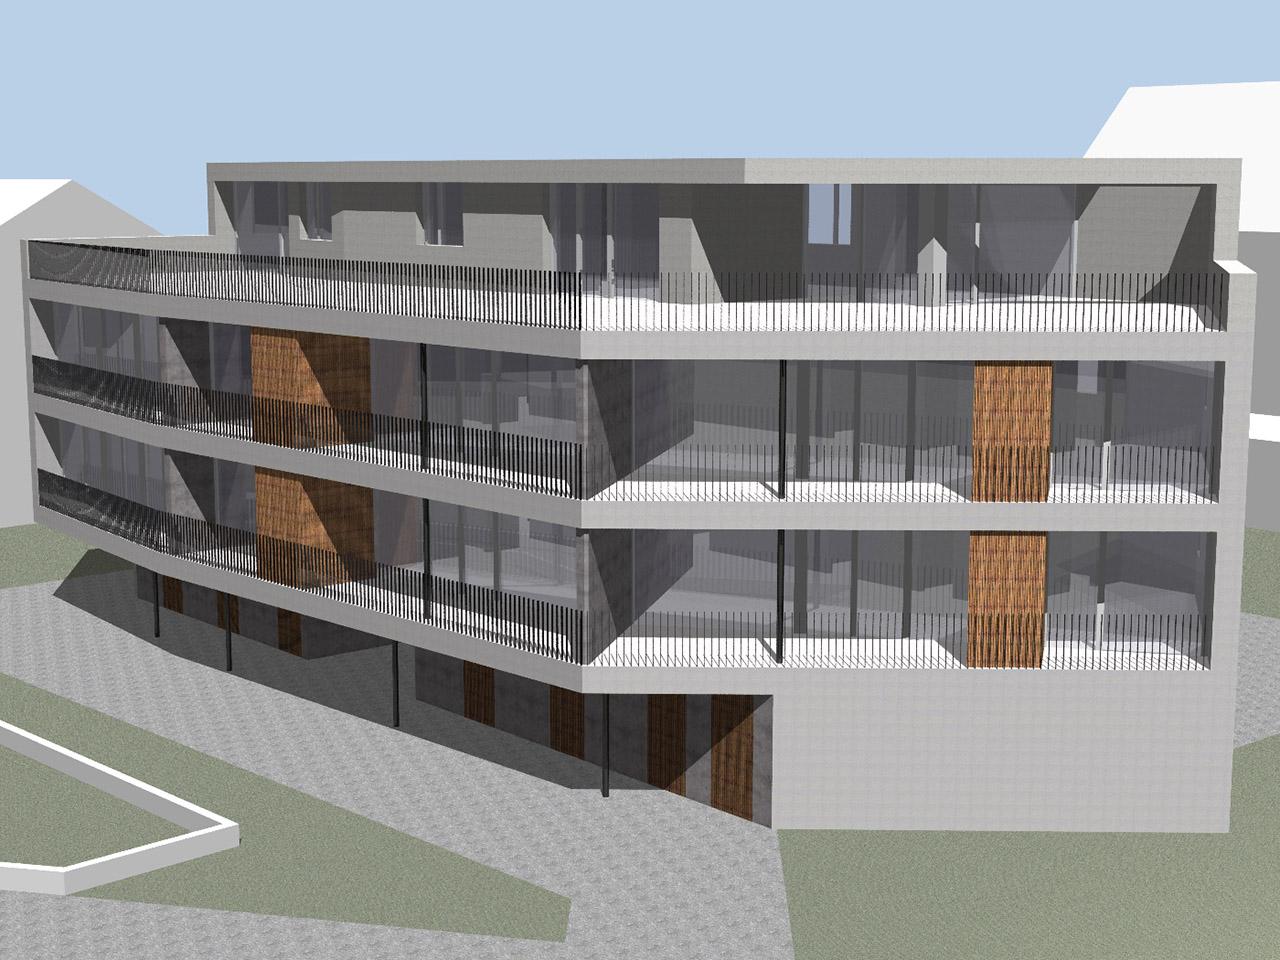 laubhus-architektur-mehrfamilienhaus-kleindoettingen